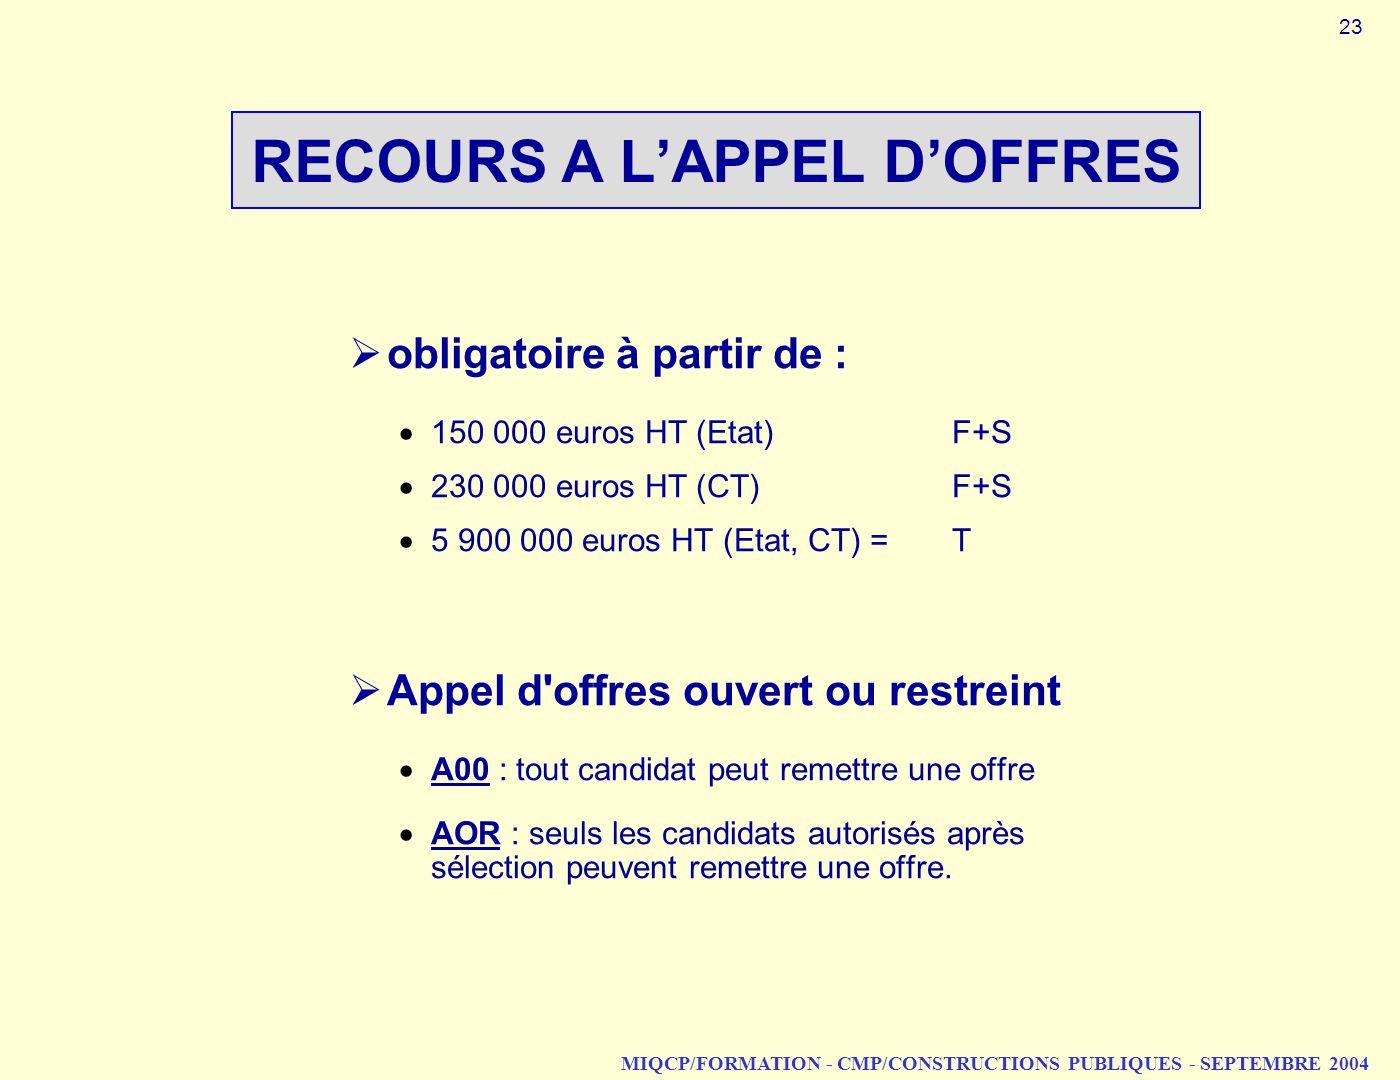 RECOURS A L'APPEL D'OFFRES